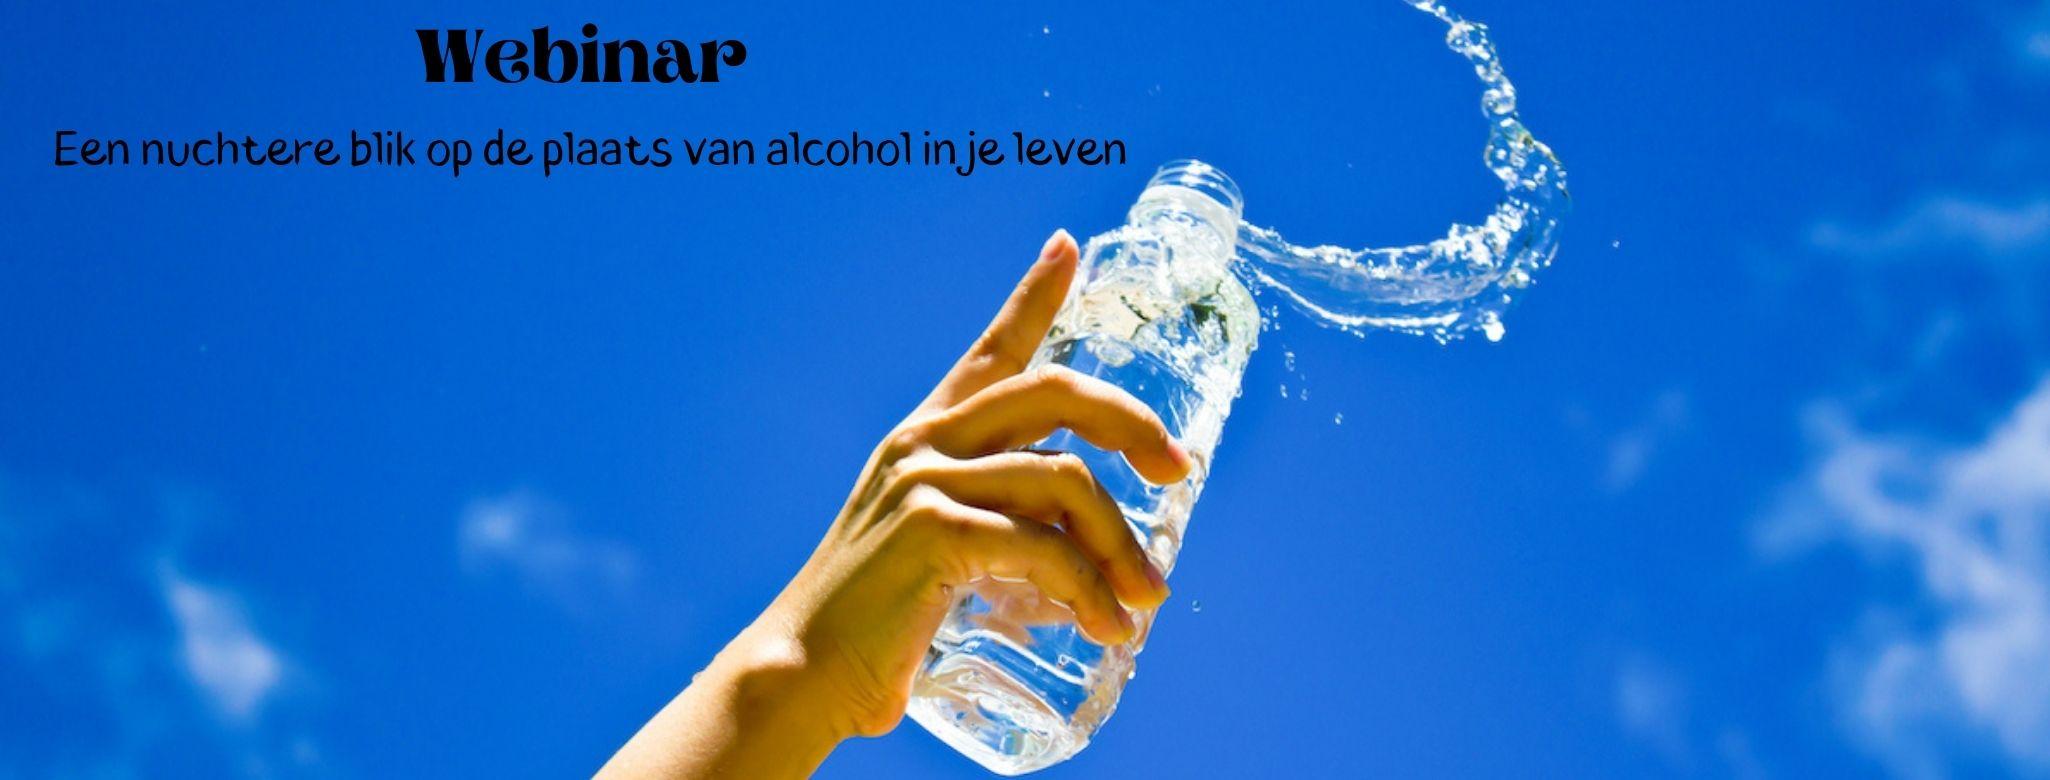 Webinar rondom alcohol